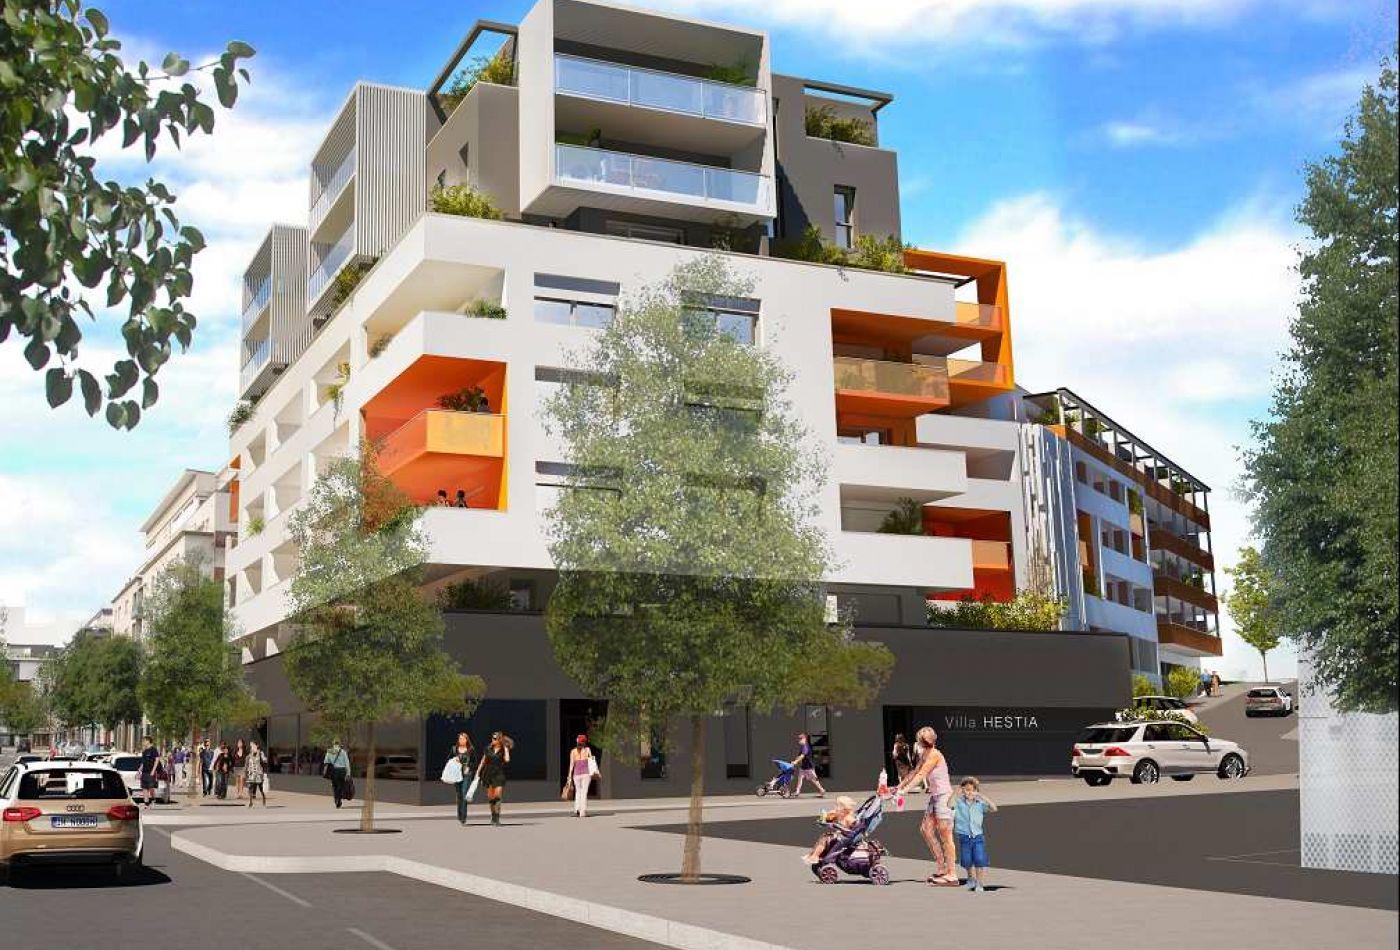 appartement en vente rodez r f 12005344 point habitat. Black Bedroom Furniture Sets. Home Design Ideas